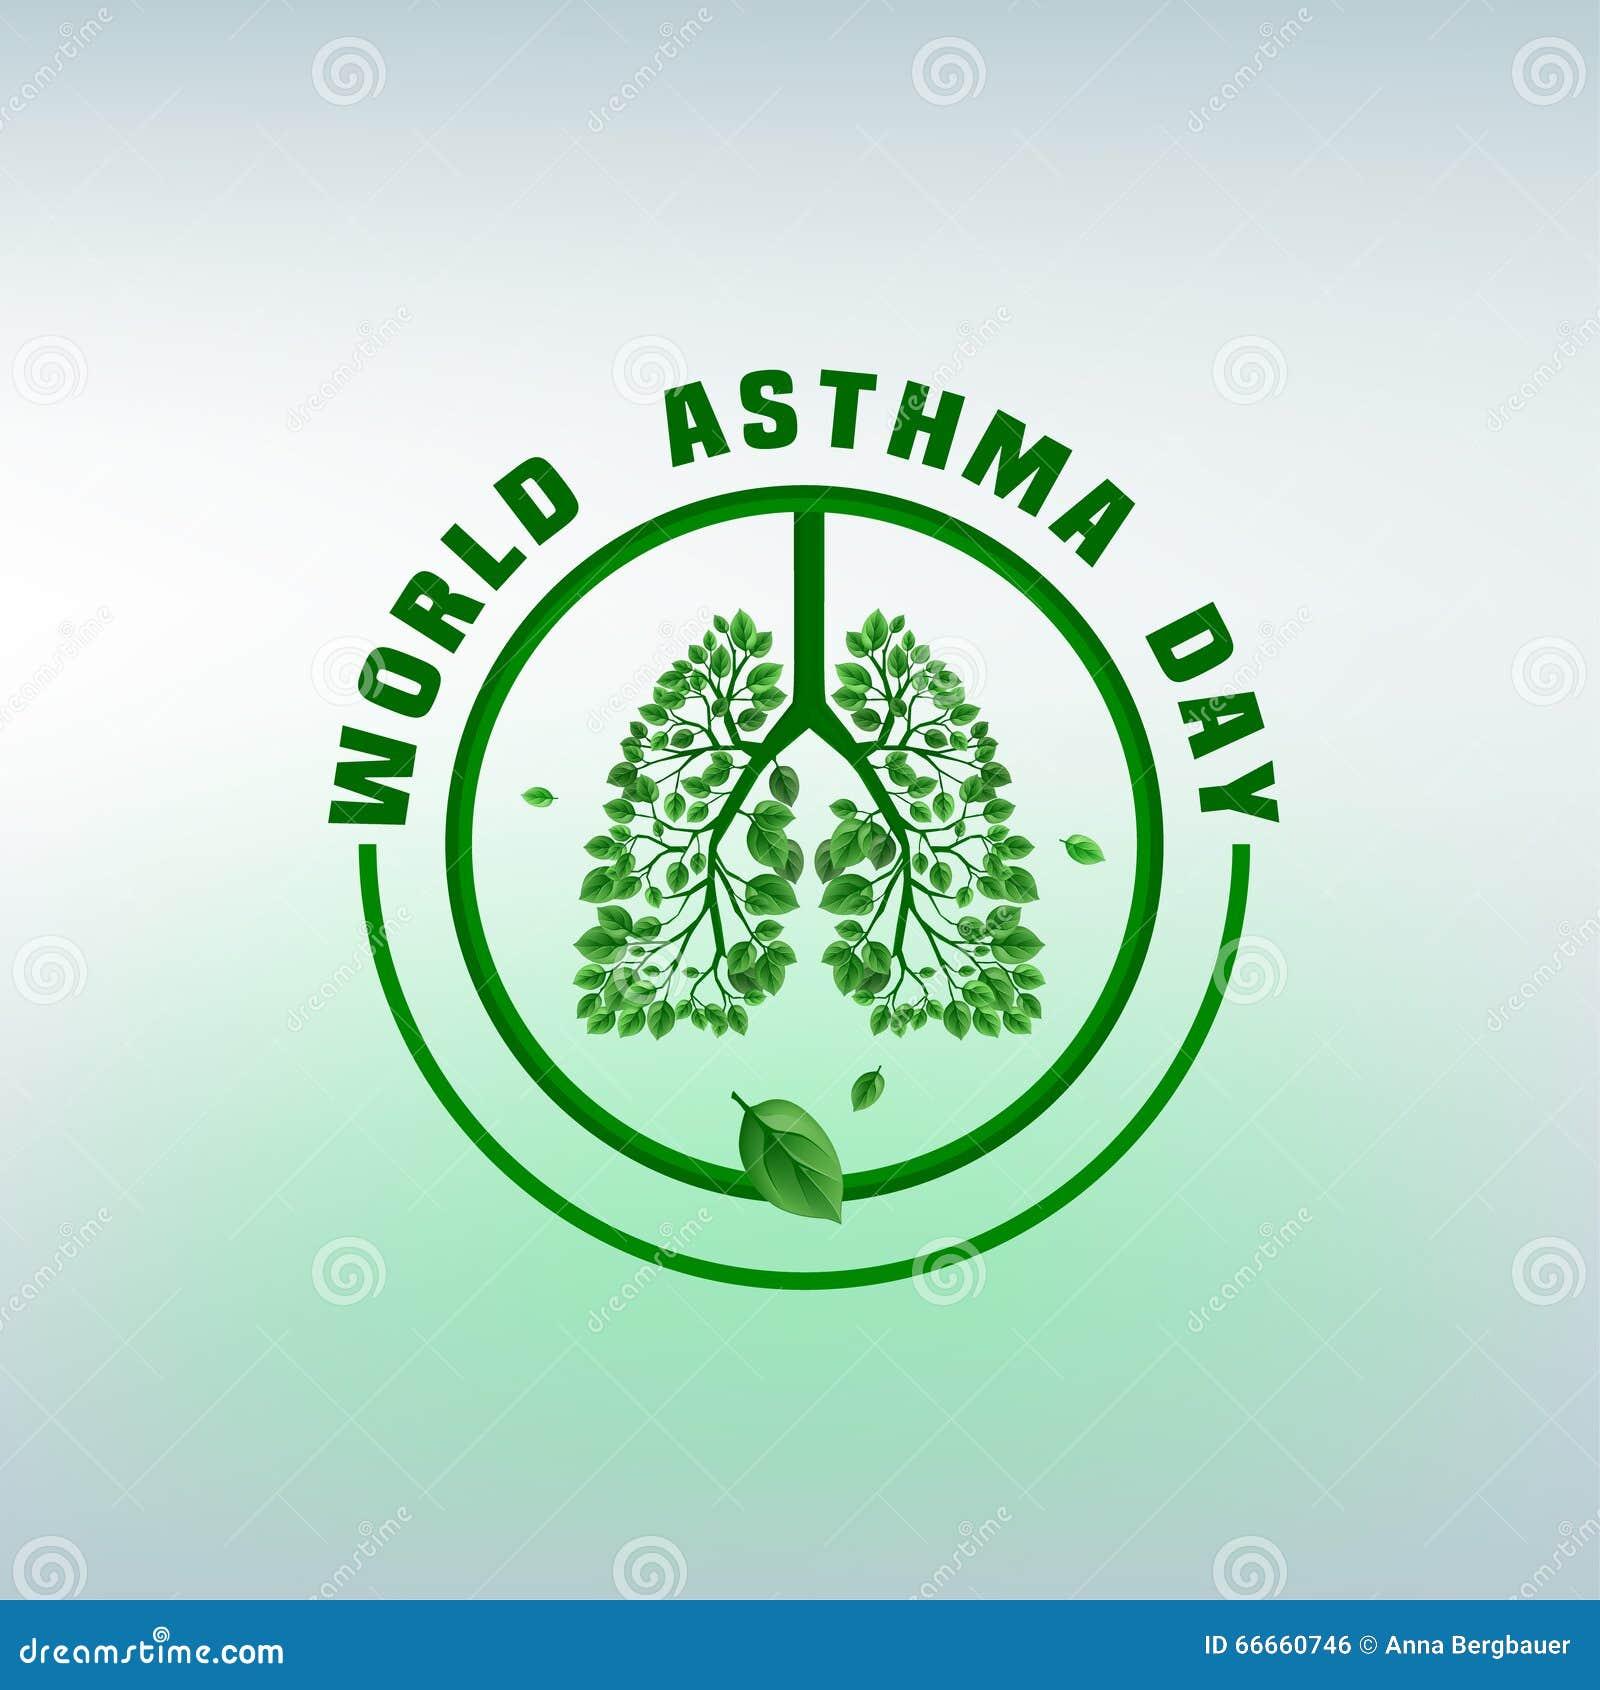 Asthma Day Logo stock vector. Illustration of anatomy - 66660746